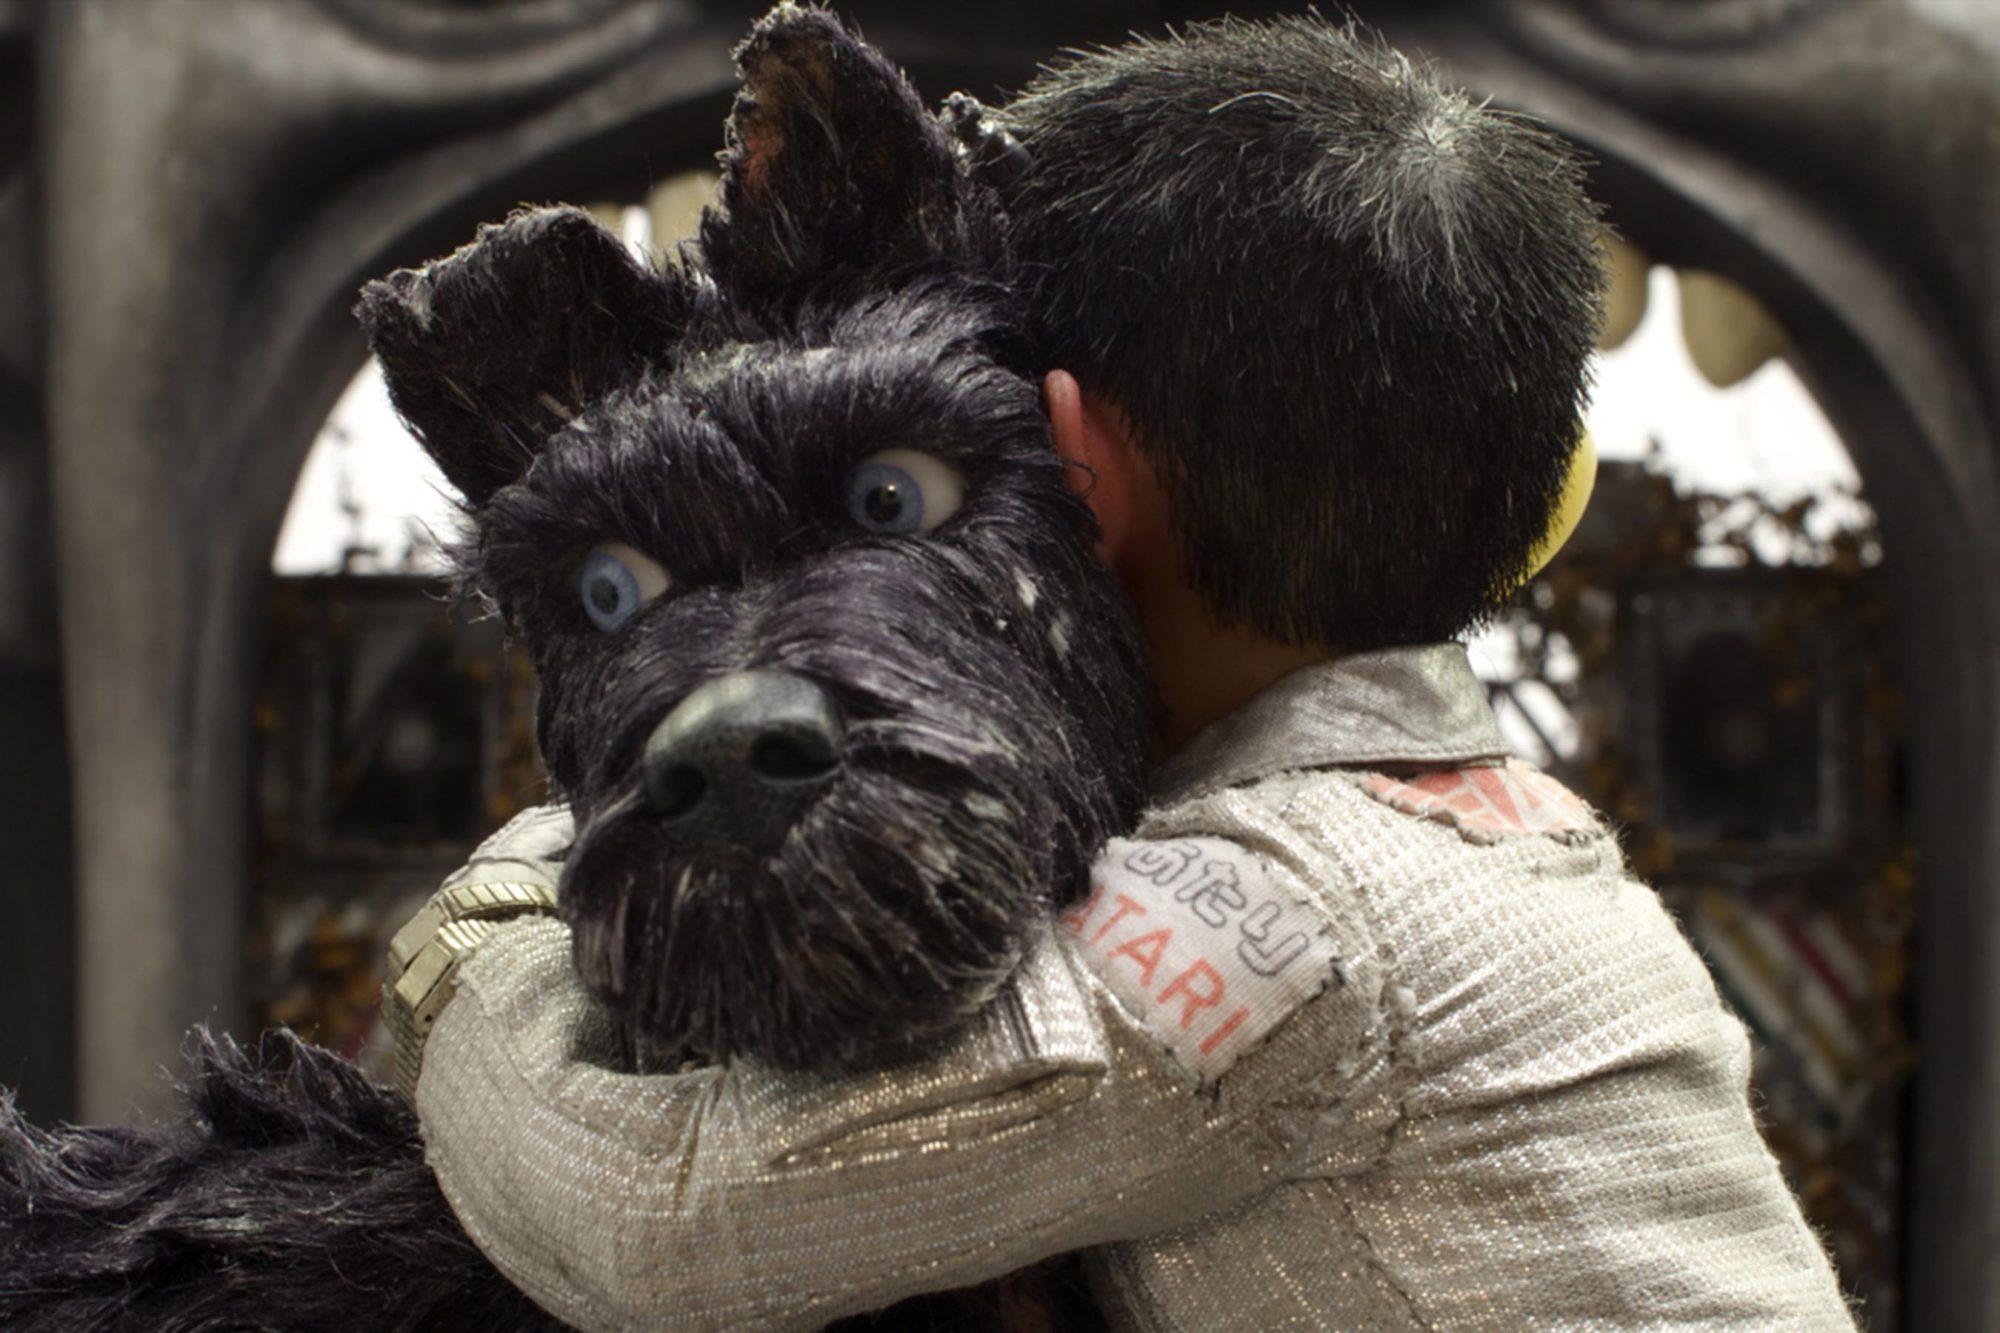 isle-of-dogs-IsleOfDogs_DomesticTrailerA_Txtd_Stereo_prores.mov.01_01_49_08.Still005_rgb